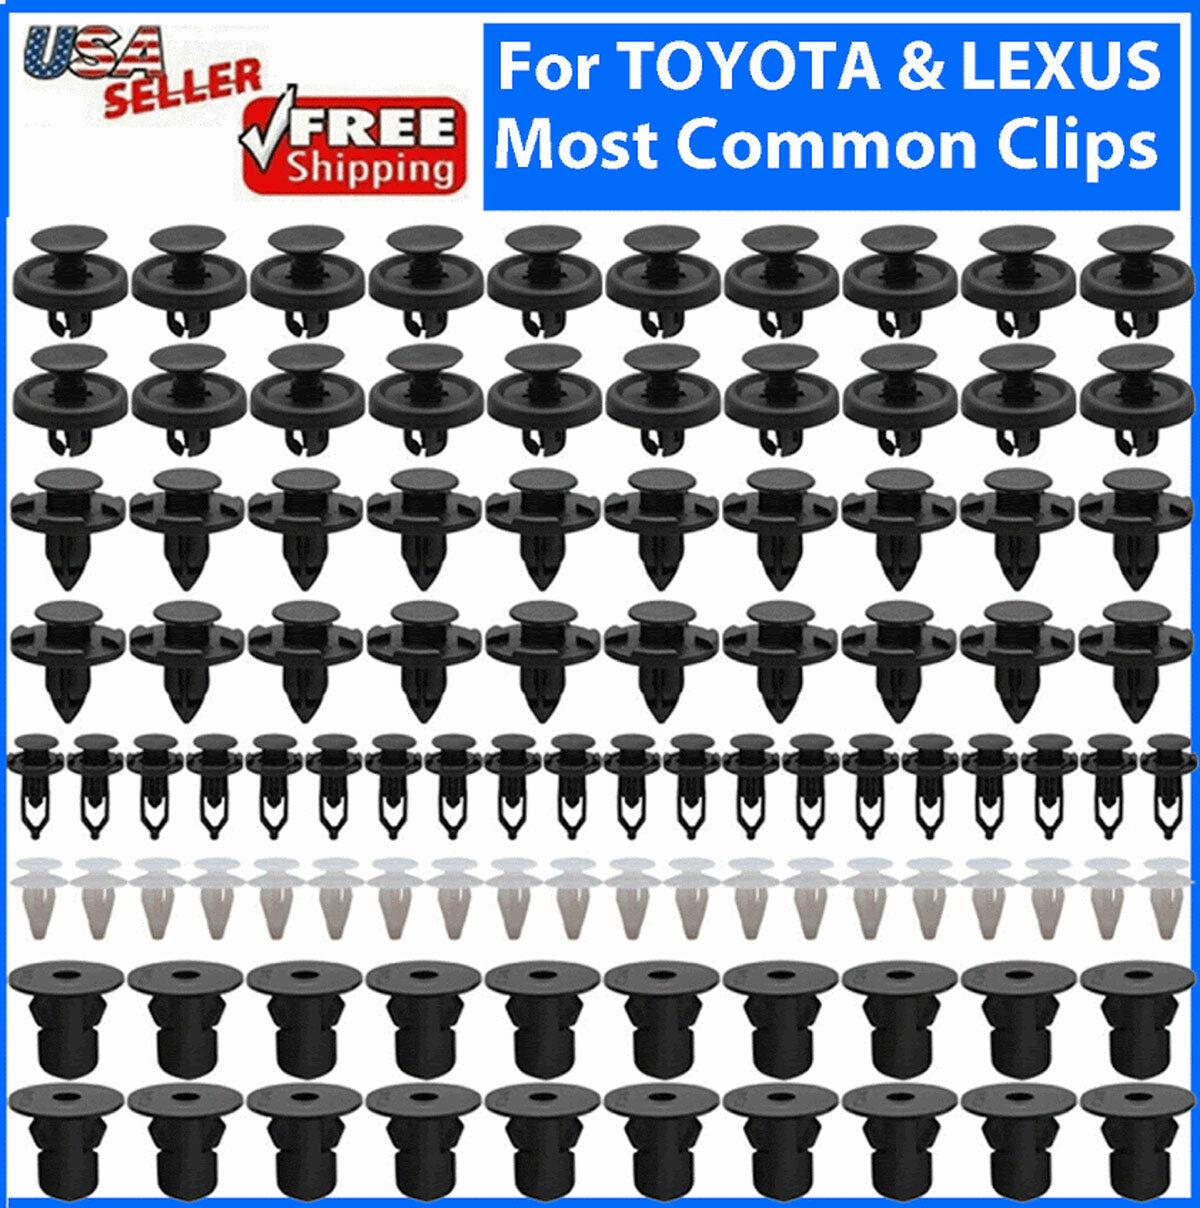 100x TOYOTA & LEXUS Trim Panel Clips Bumper Fender Push Pin Rivet 7 8 9mm Engine Car & Truck Parts